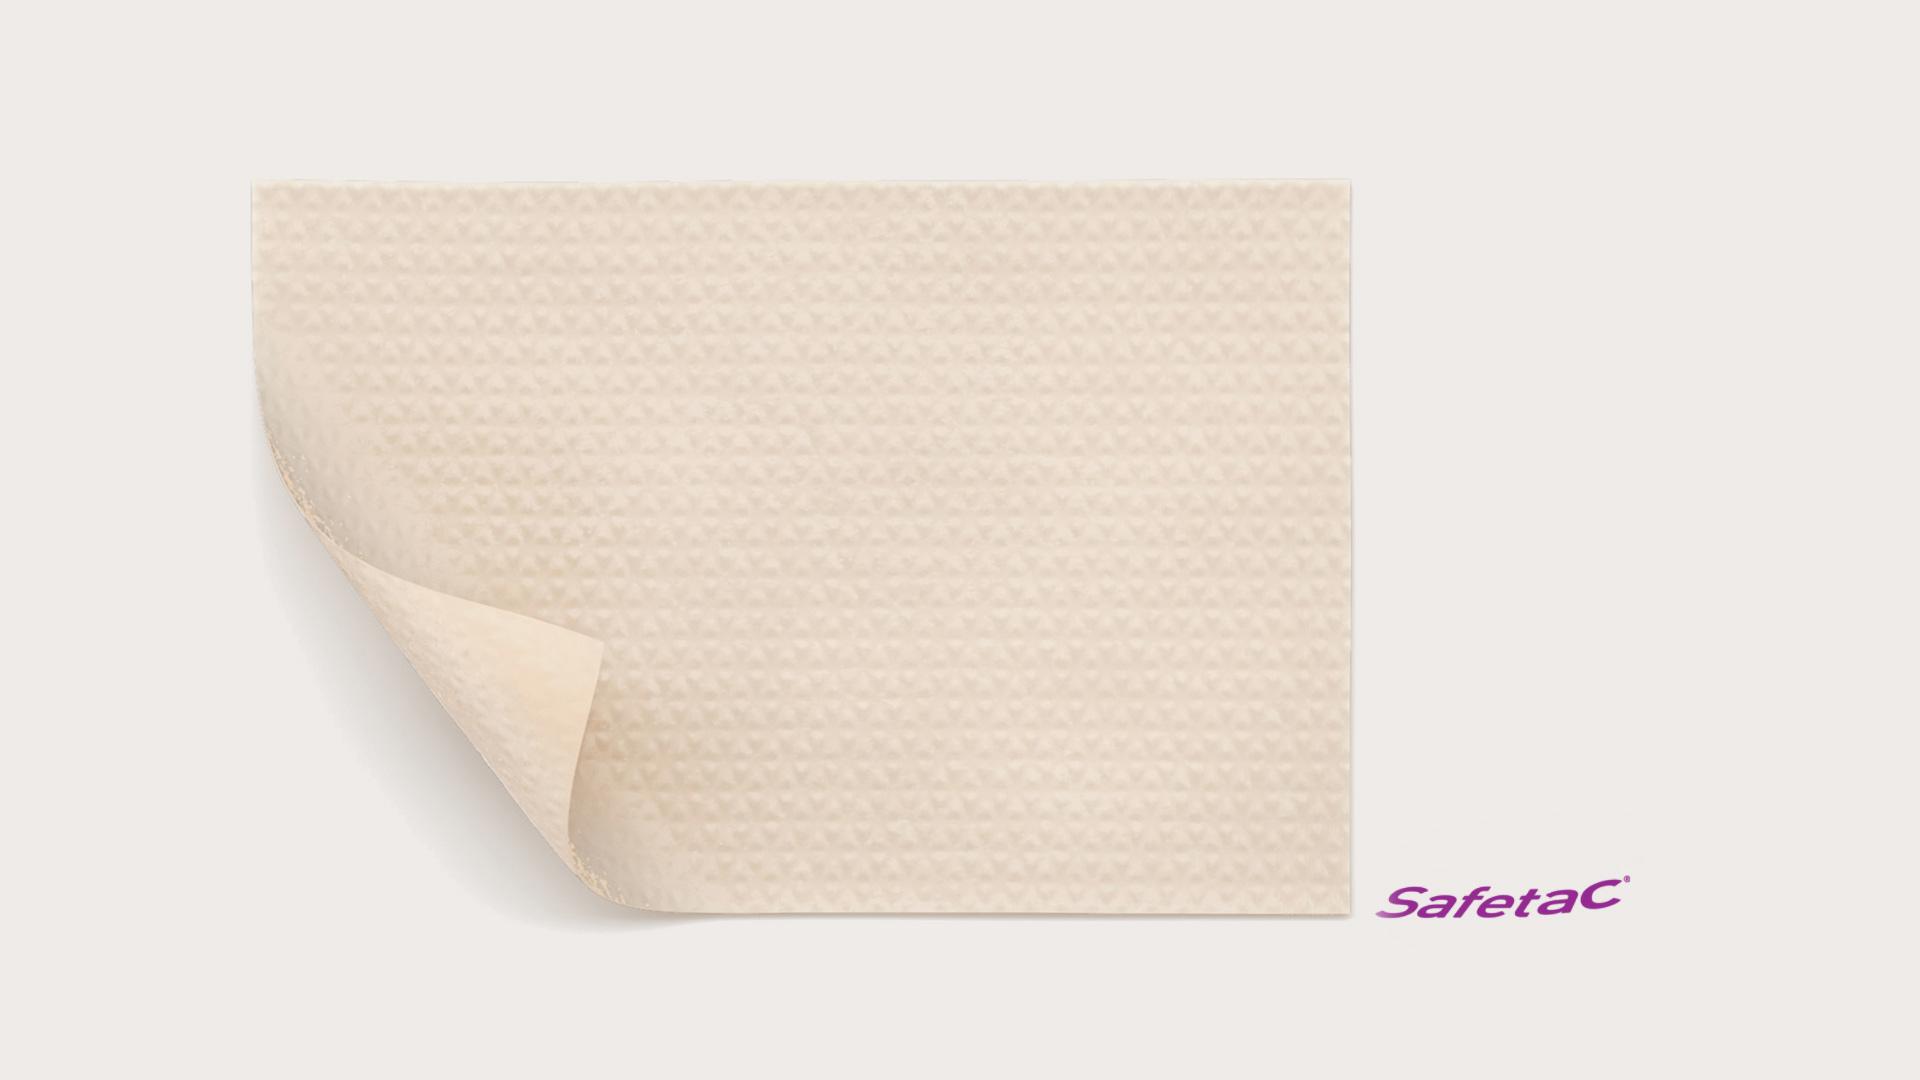 Self-adherent dressing for scar management with Safetac